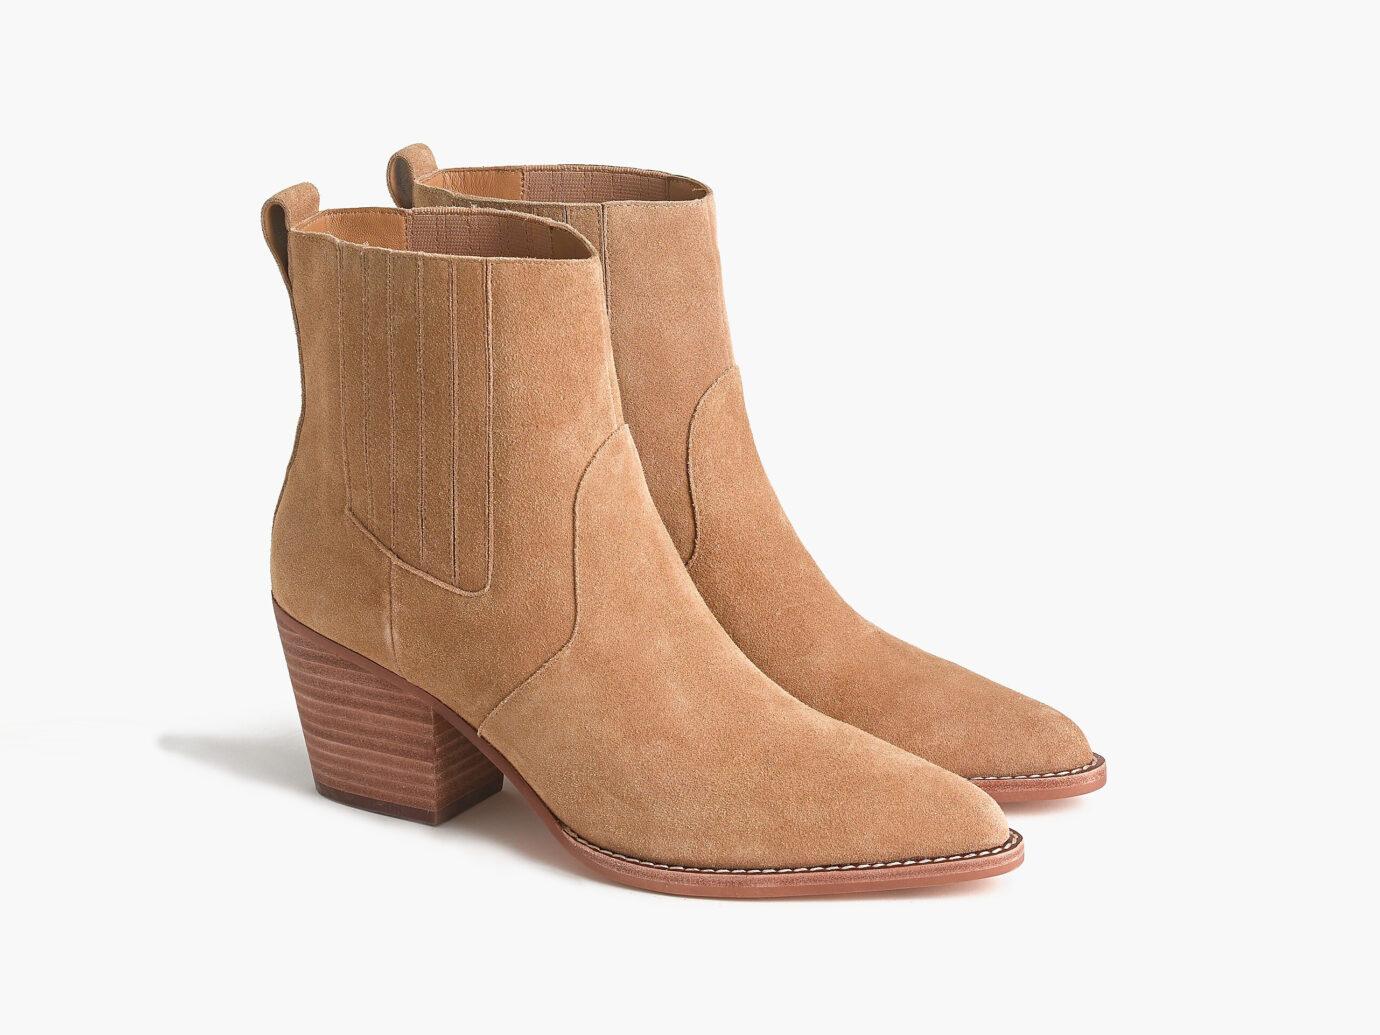 J.Crew Western Boots